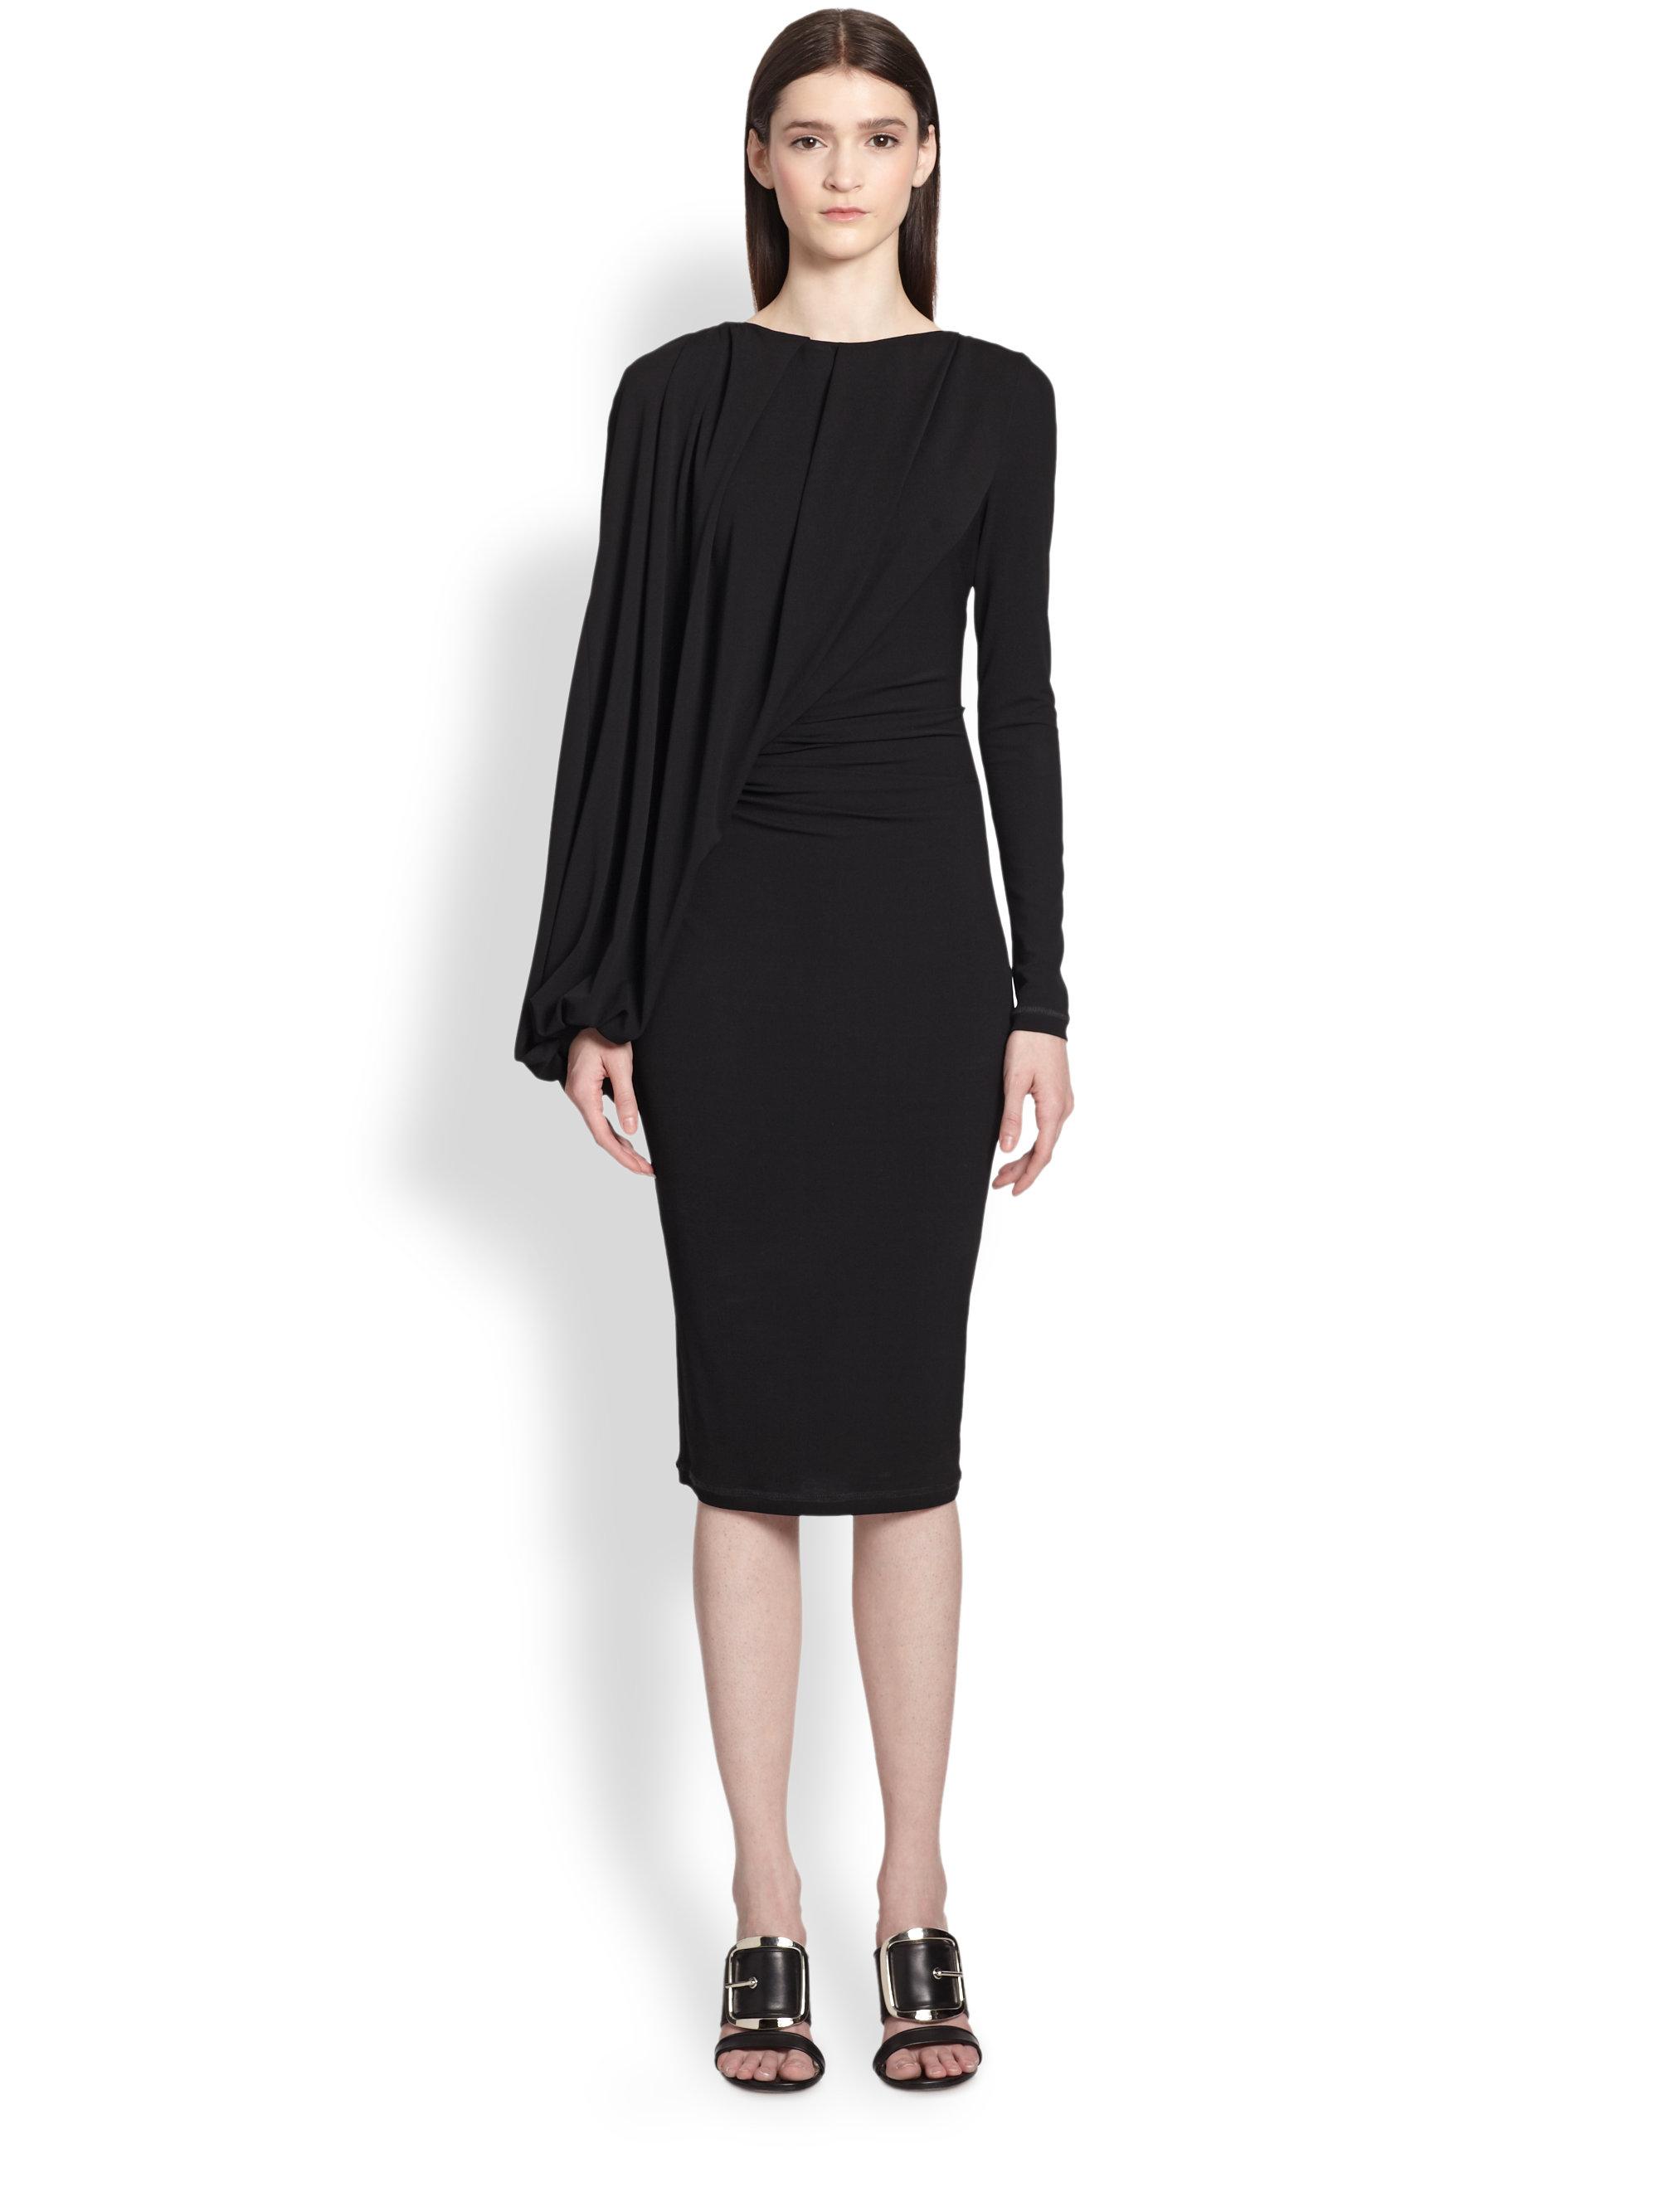 Givenchy Jersey Balloon-Drape Dress in Black | Lyst Victoria Beckham Dresses